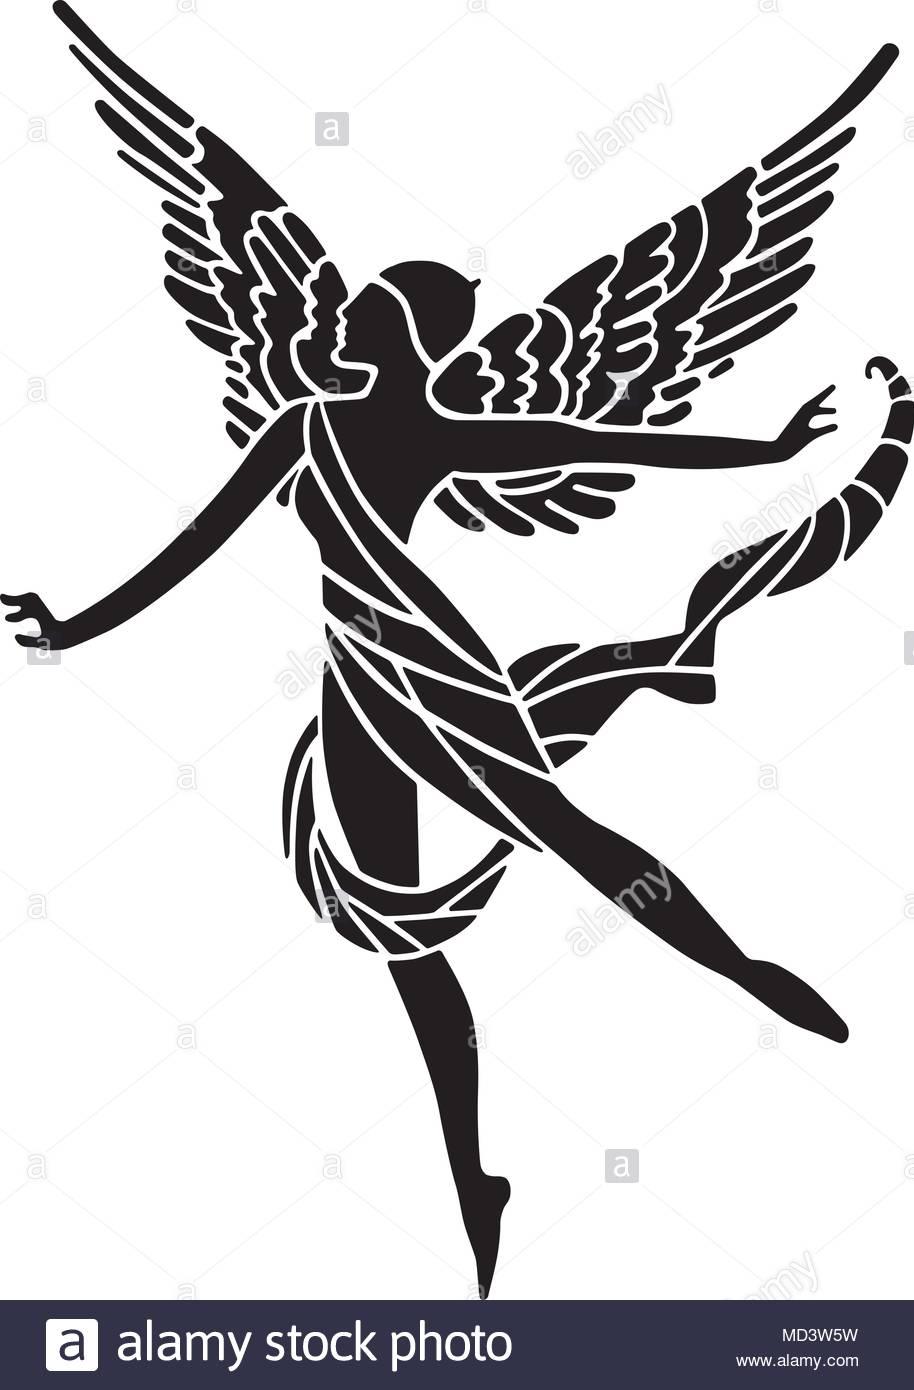 914x1390 Art Deco Winged Goddess